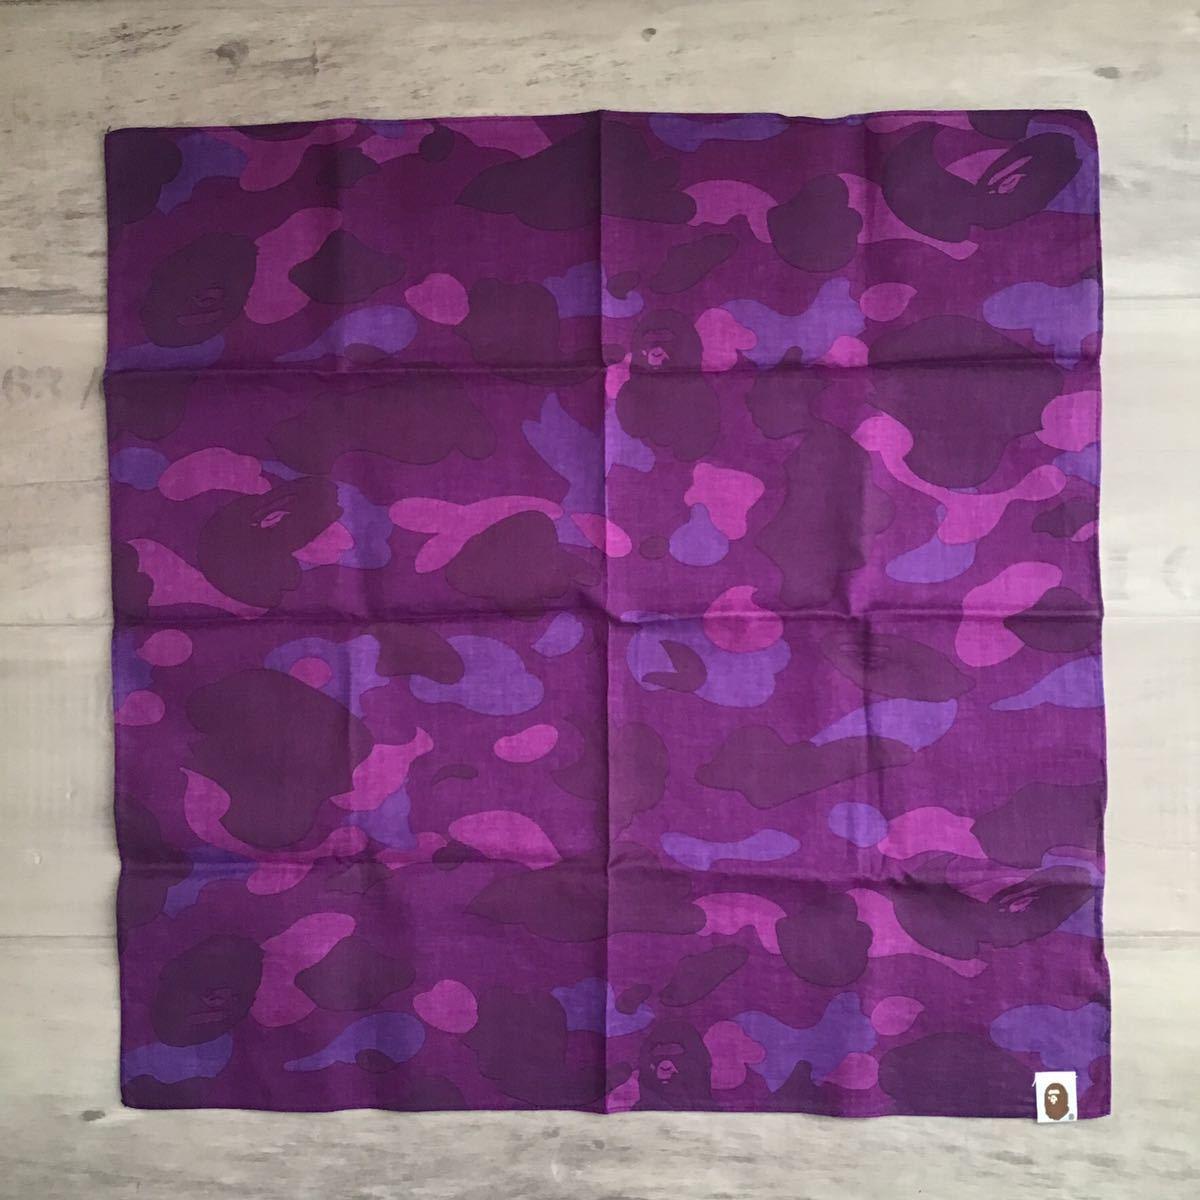 purple camo バンダナ a bathing ape BAPE エイプ ベイプ アベイシングエイプ bandana 紫 迷彩 パープルカモ 1313